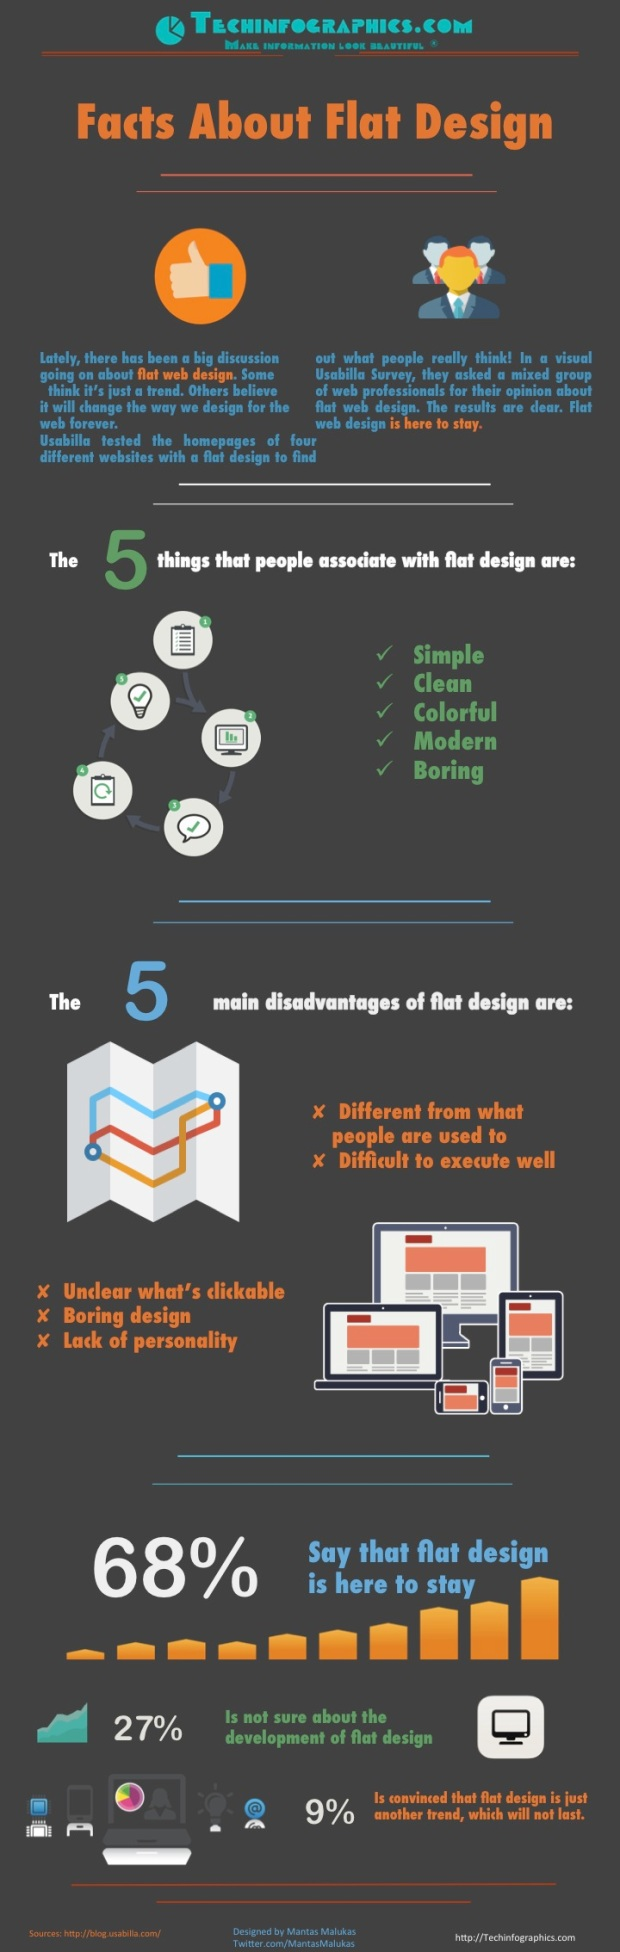 flat-design-facts_525b30220dc28